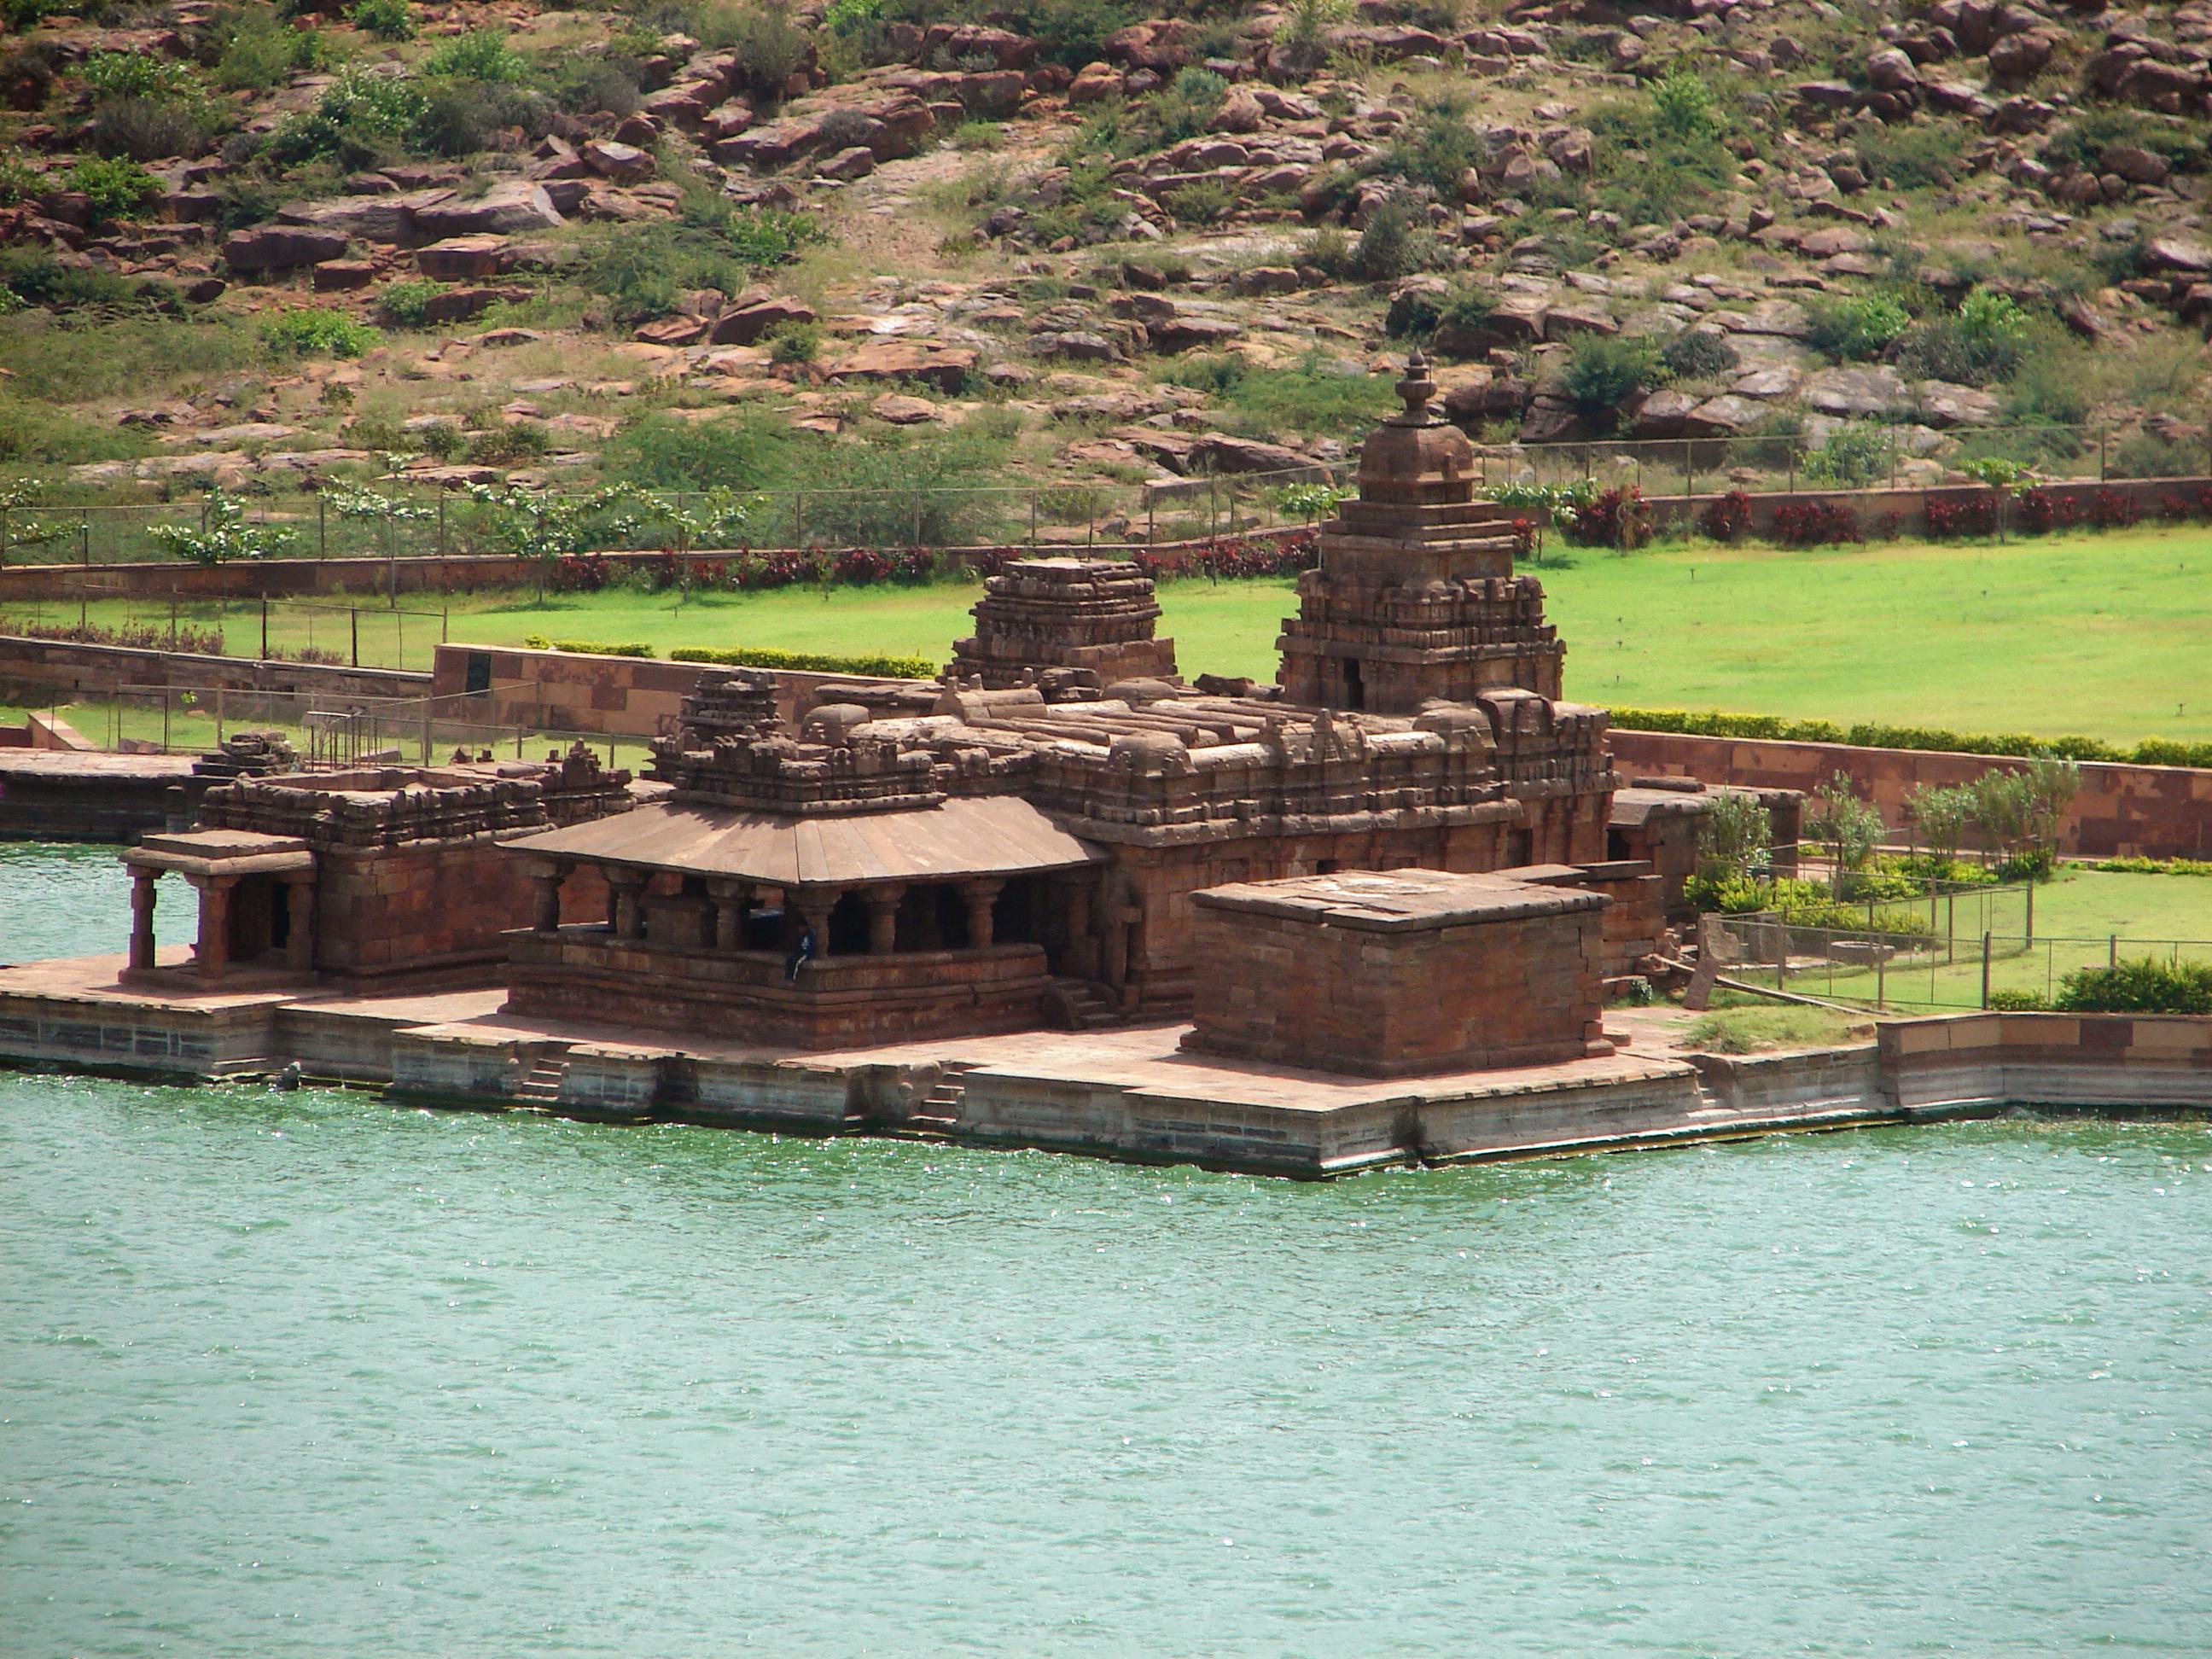 Bhutanatha group of temples facing the Agasythya Tank